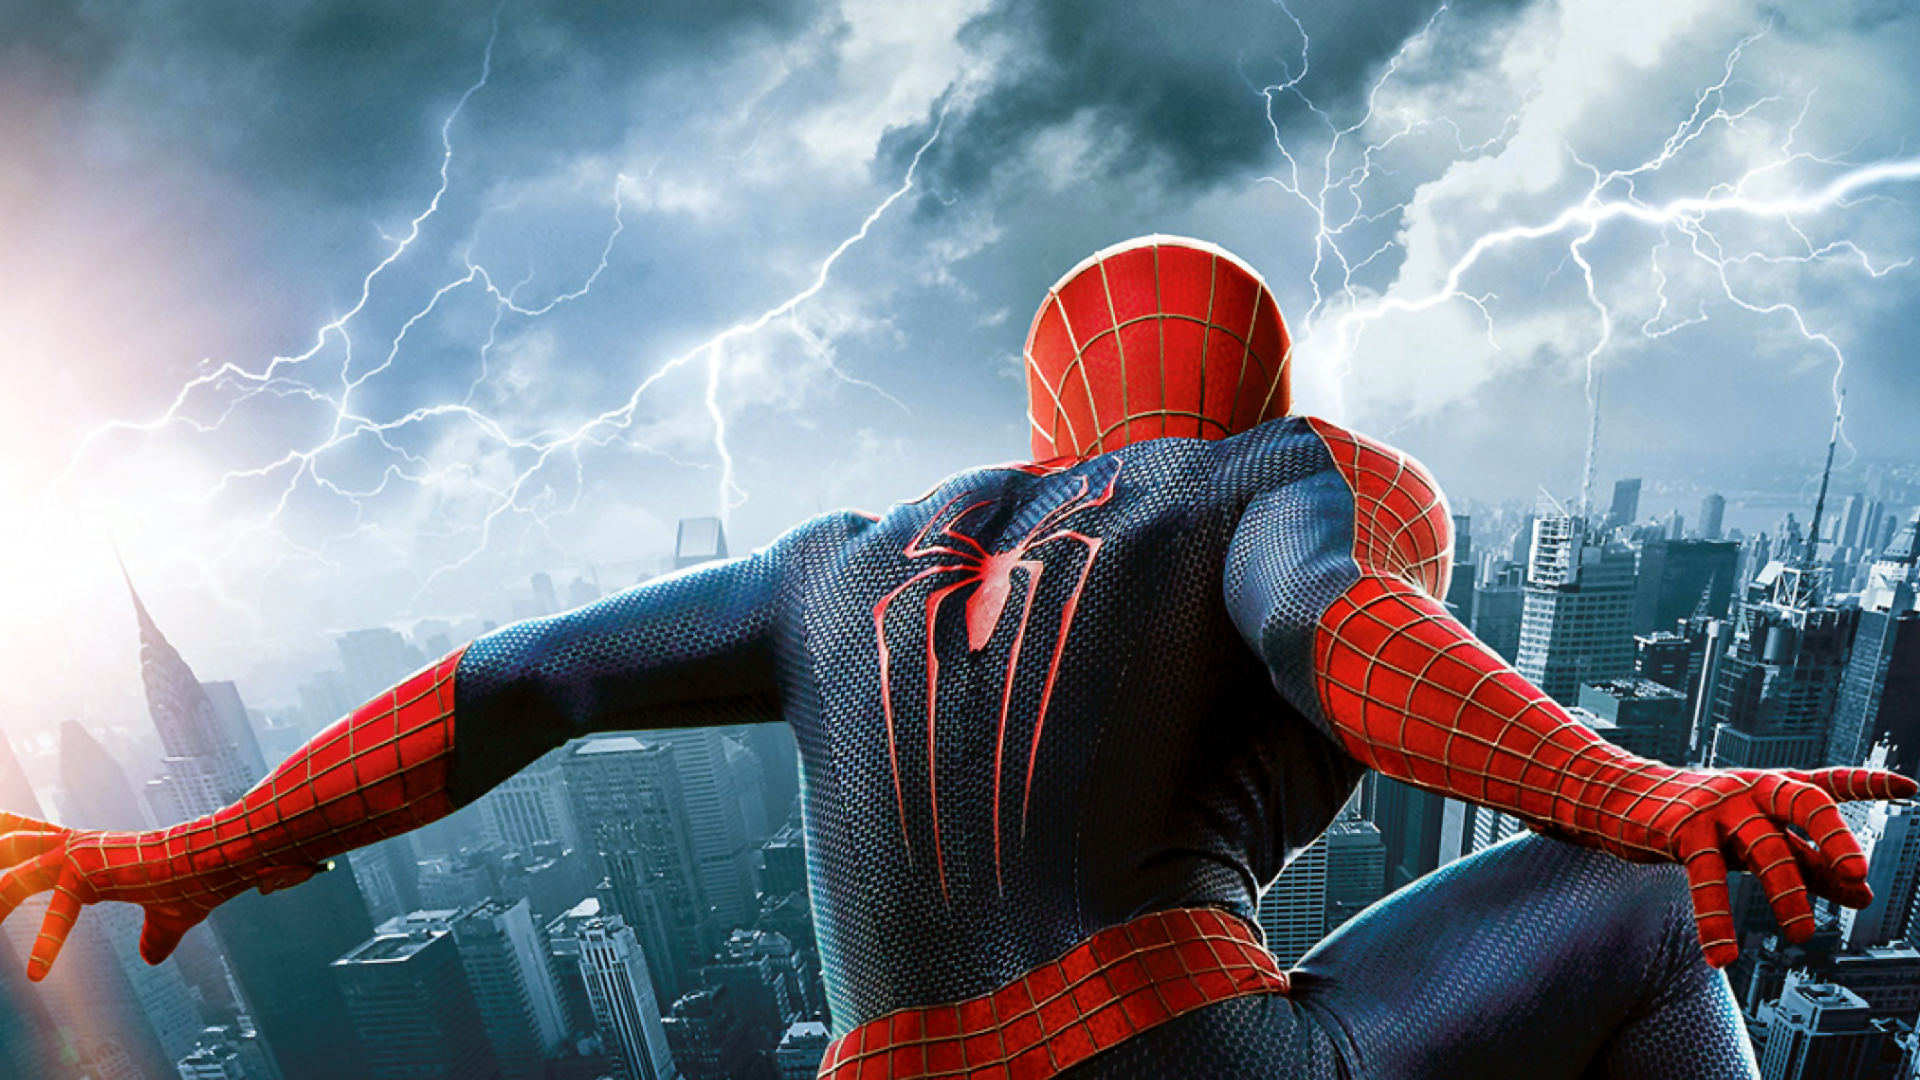 watch a live stream of 'the amazing spider-man 2' premiere | fandango